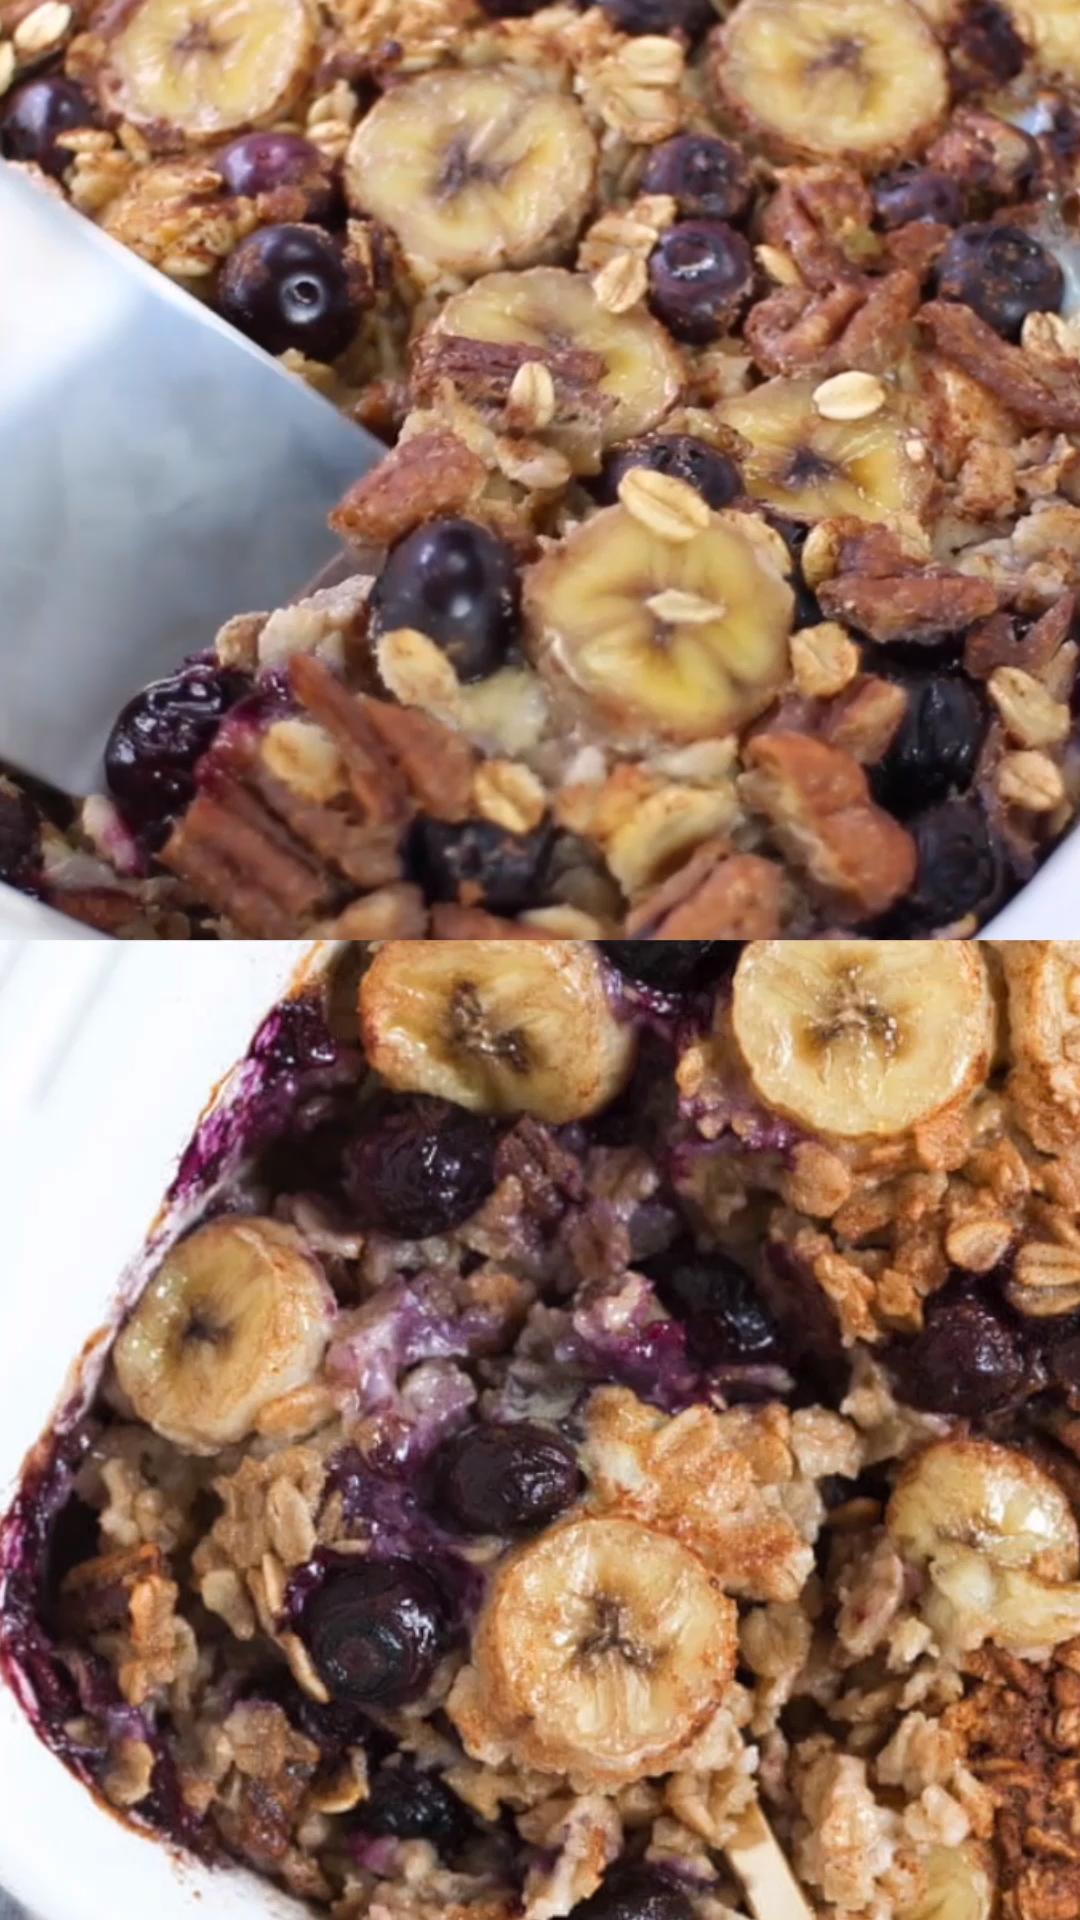 Banana Berry Baked Oatmeal images